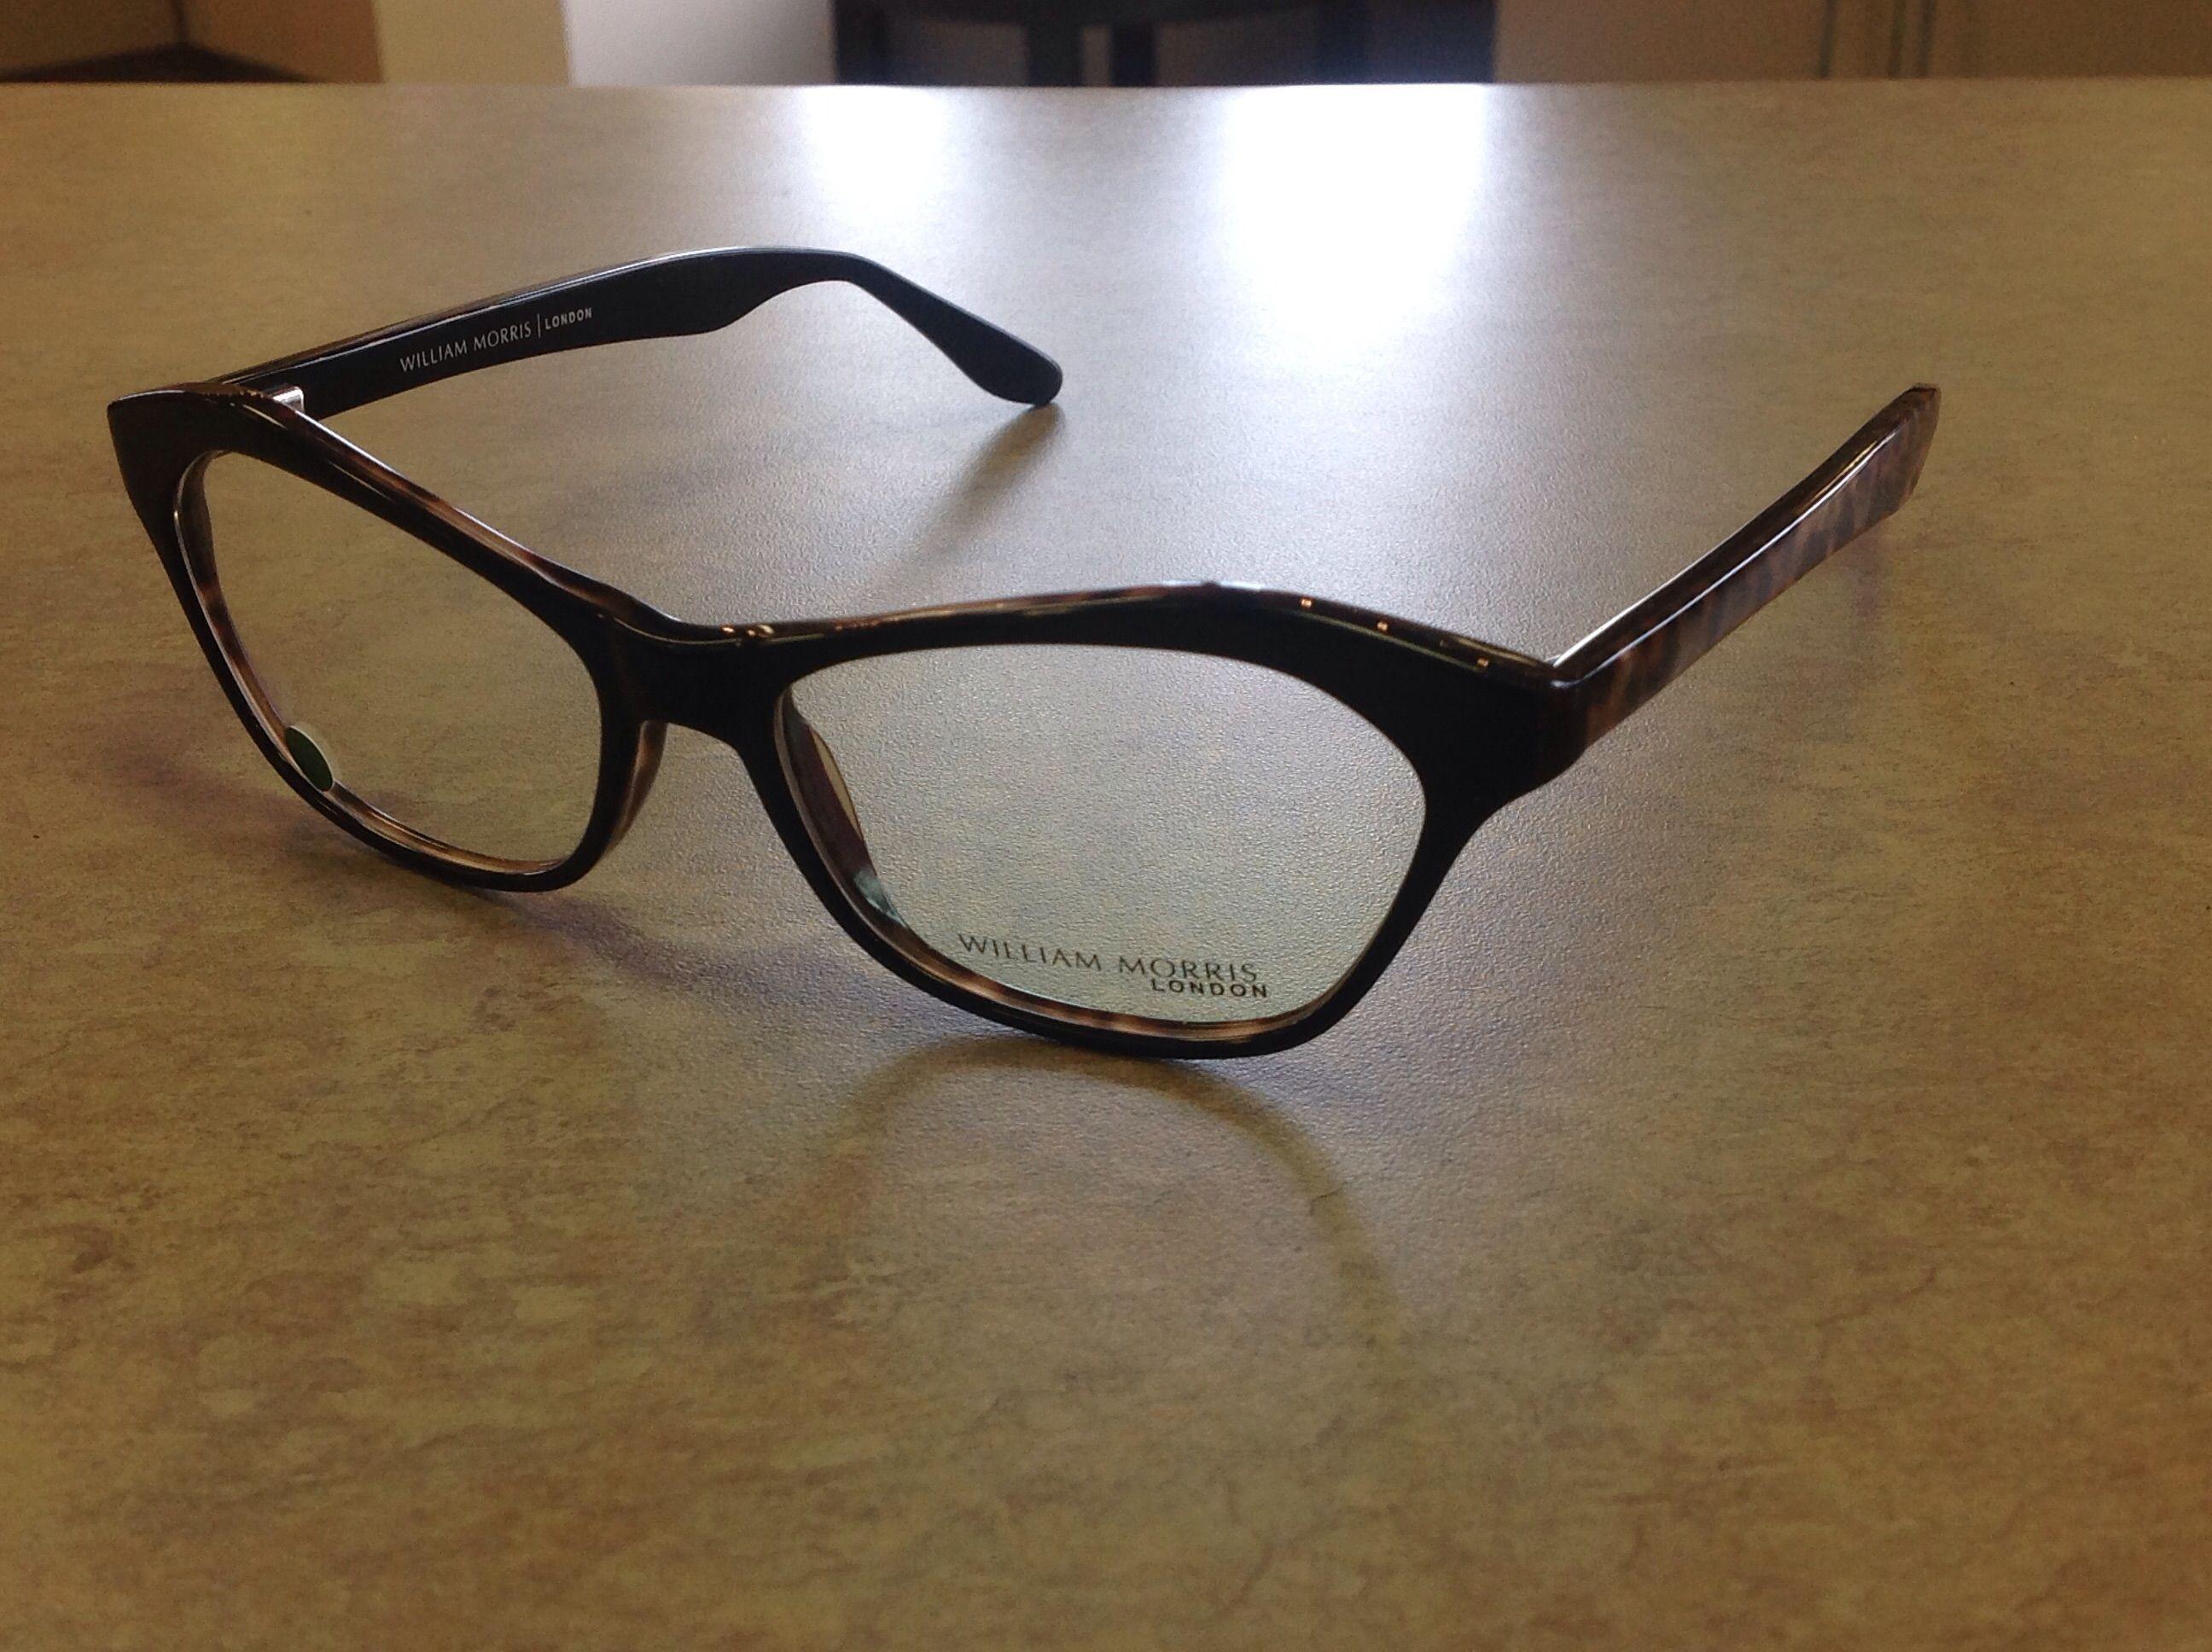 25a1a8a1185150 William Morris 9906 | Classique Eyewear | William morris